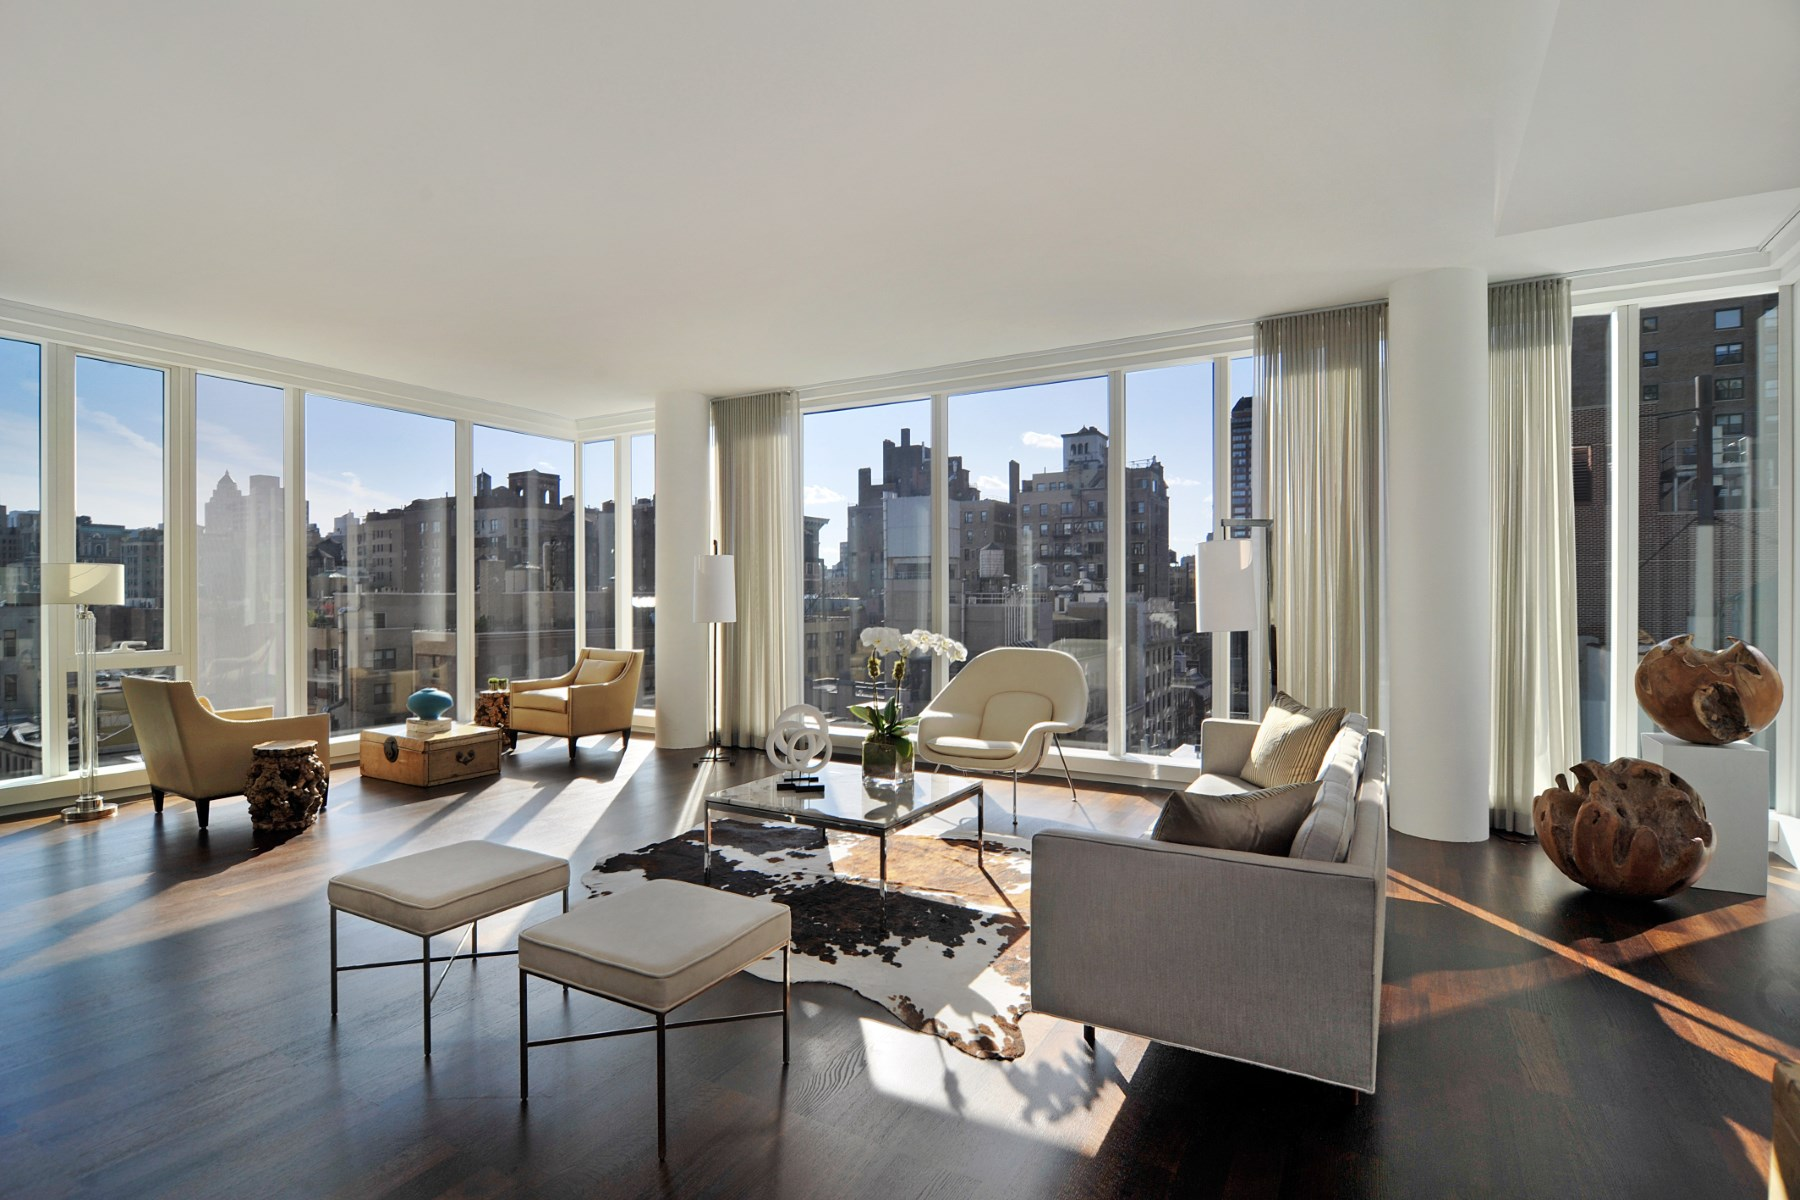 rentals property at 151 East 85th Street, Apt 11A